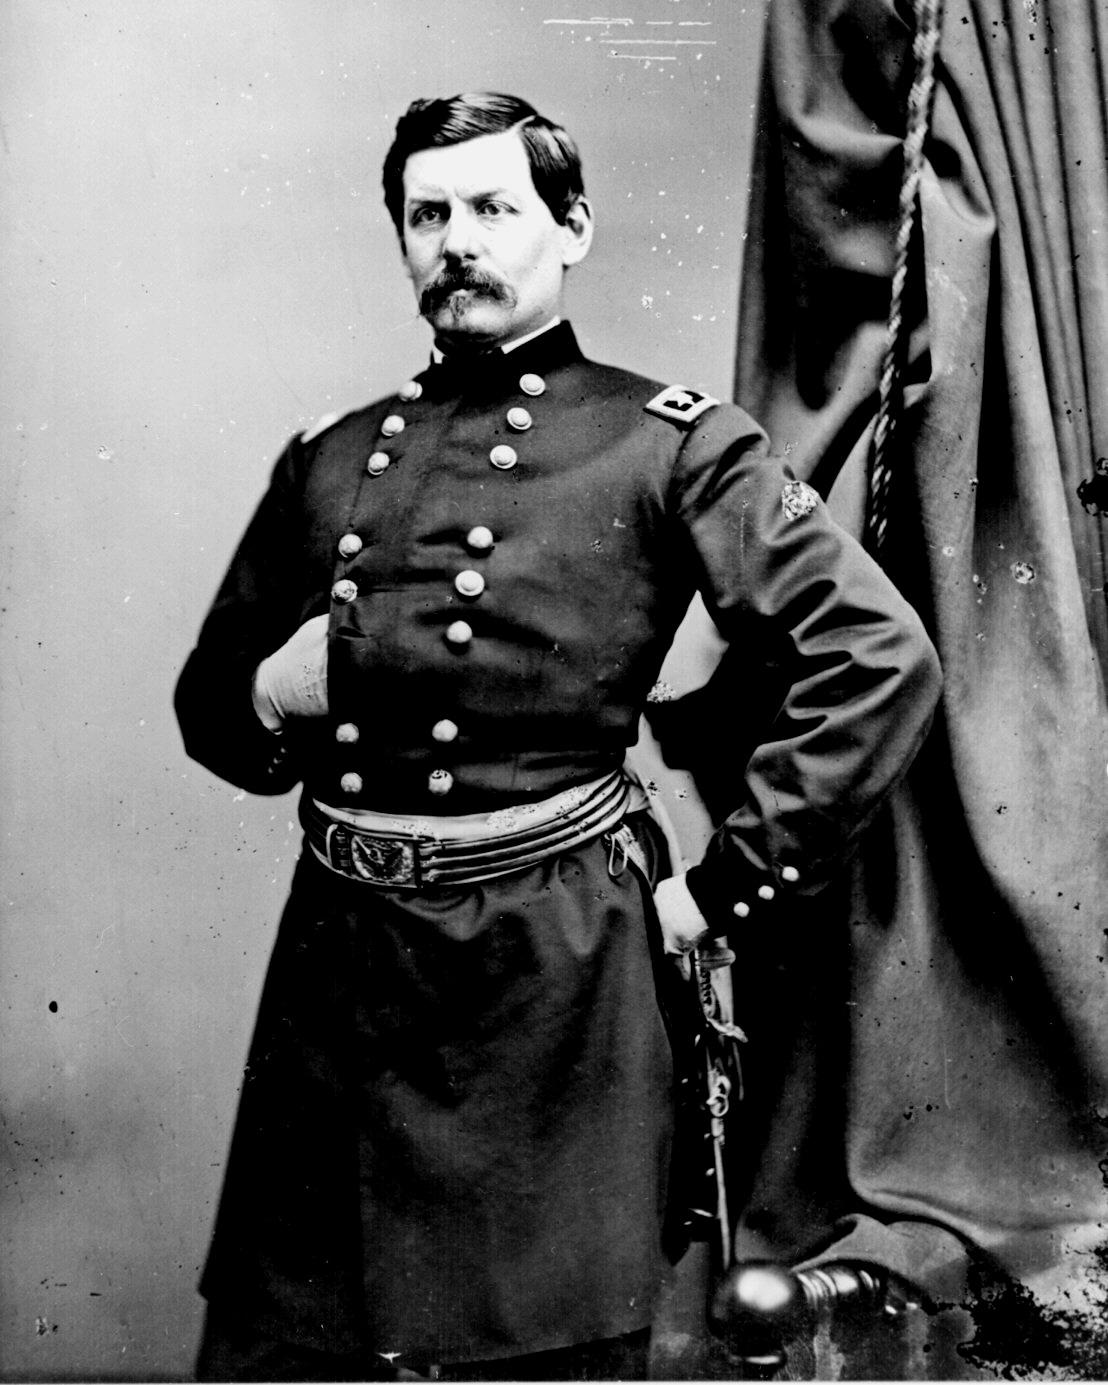 GeorgeMcClellan